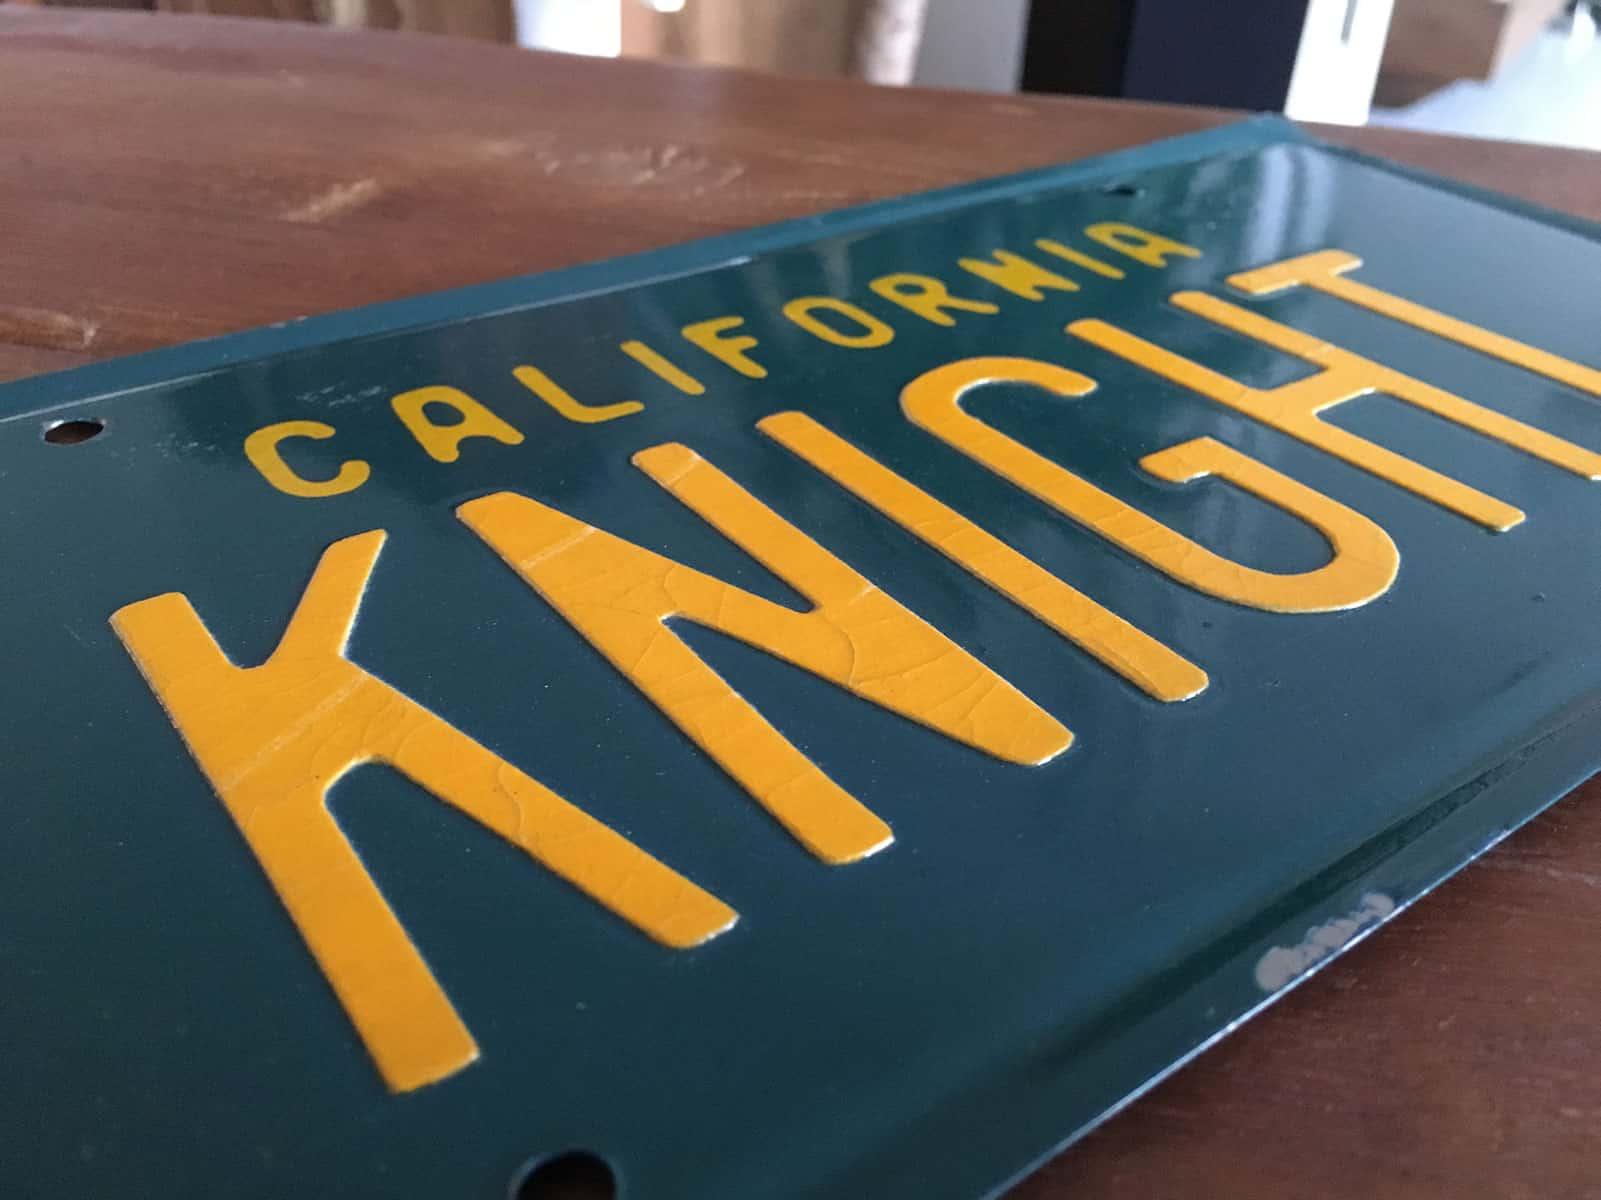 KITT Replika Original License Plate Prop Knight Rider of Germany